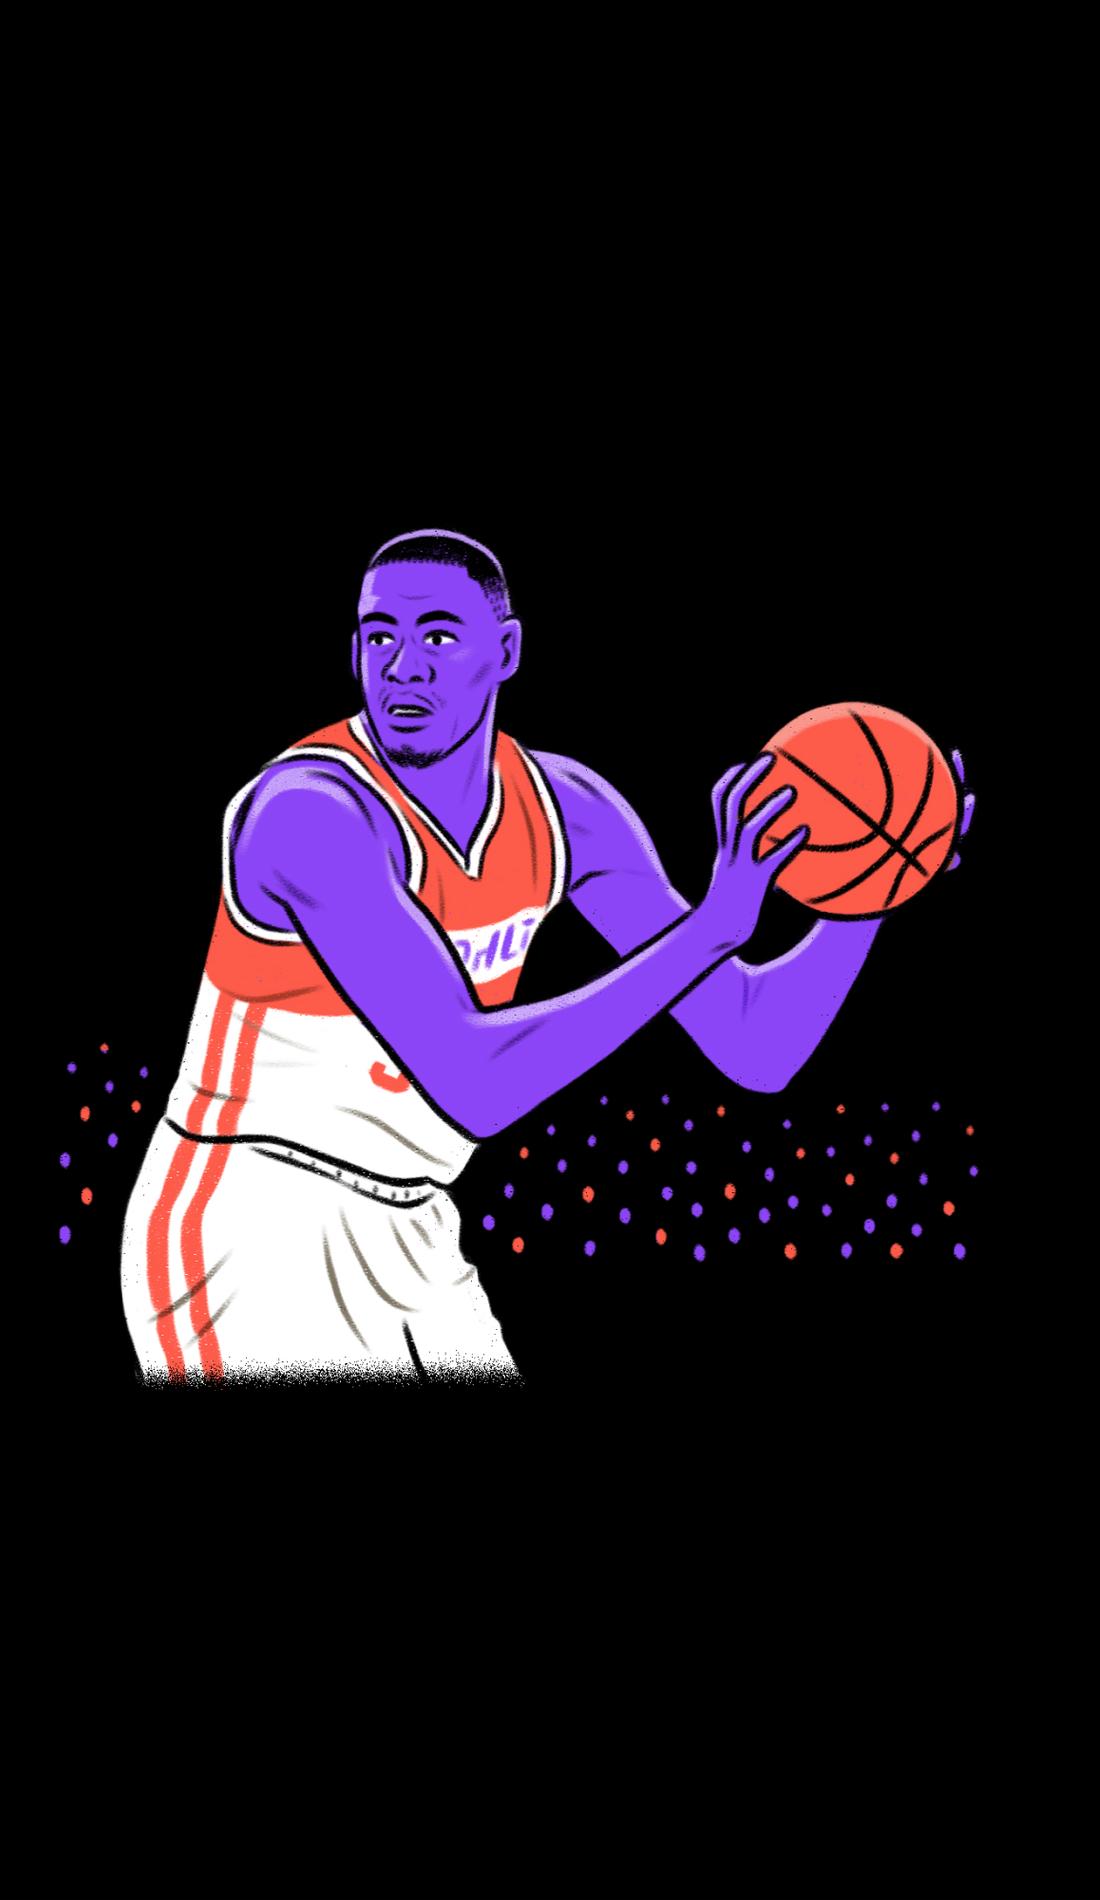 A Samford Bulldogs Basketball live event